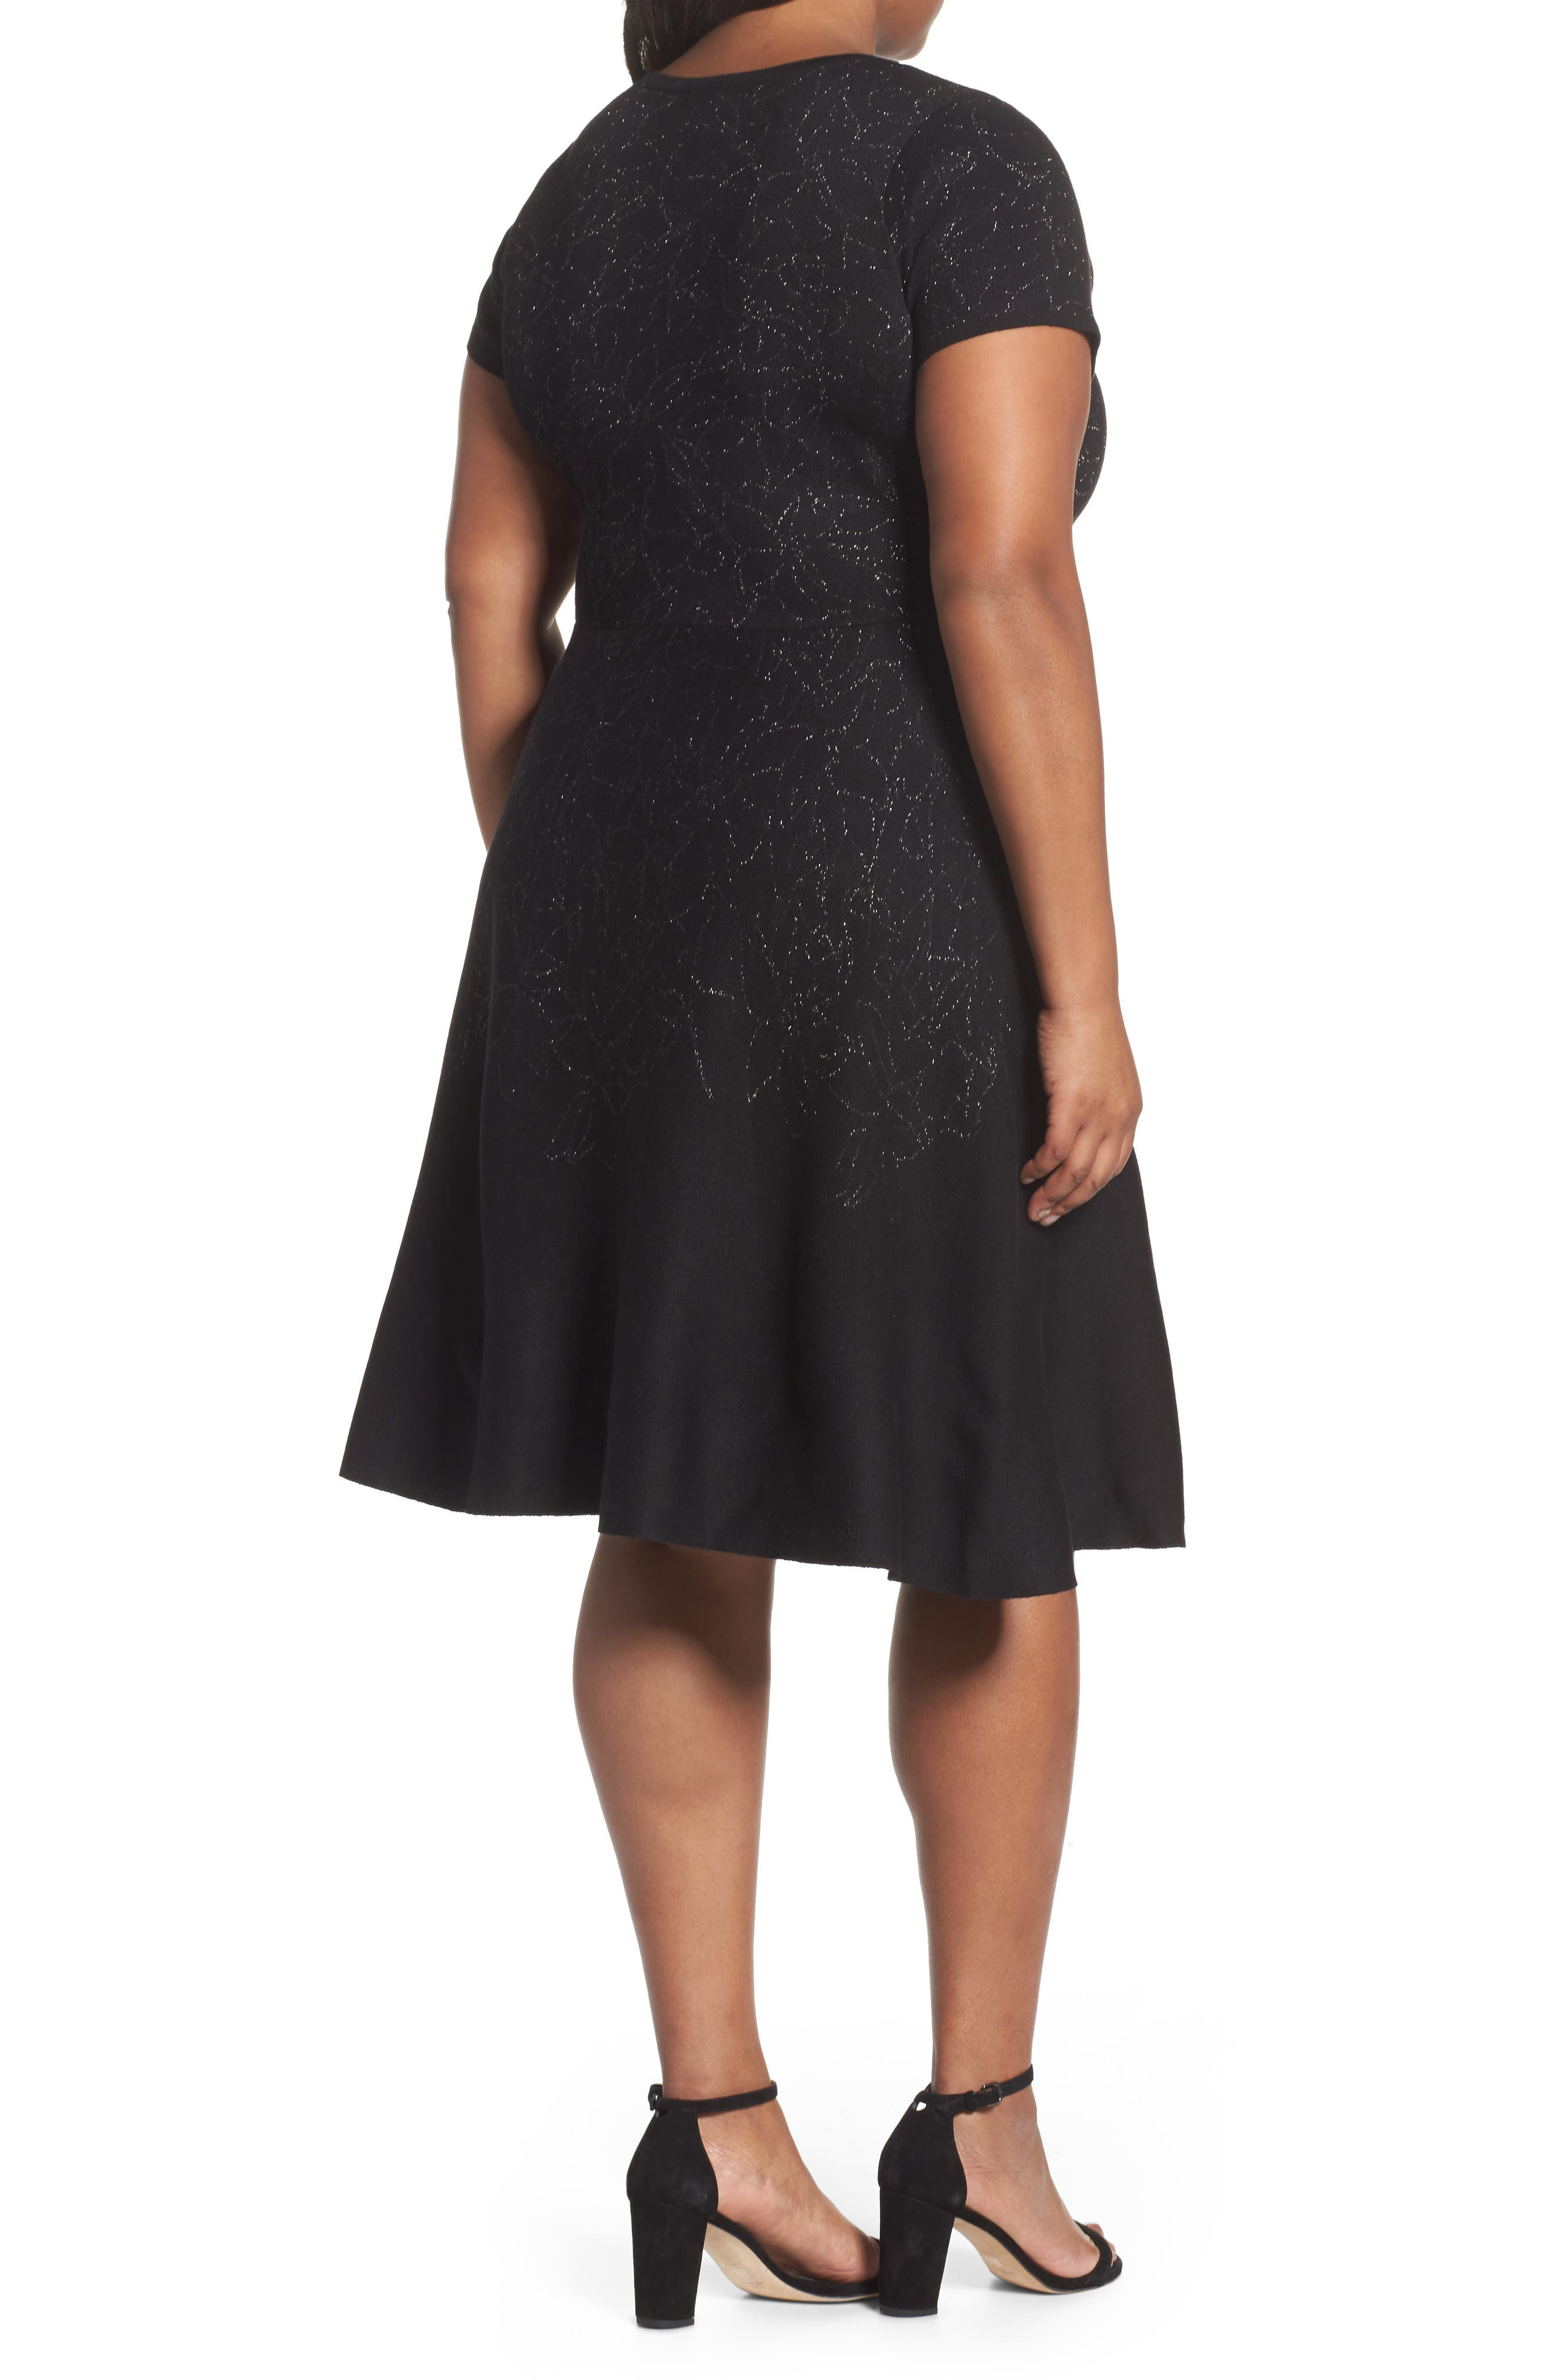 Alternate Image 2  - Taylor Dresses Metallic Knit Fit & Flare Dress (Plus Size)